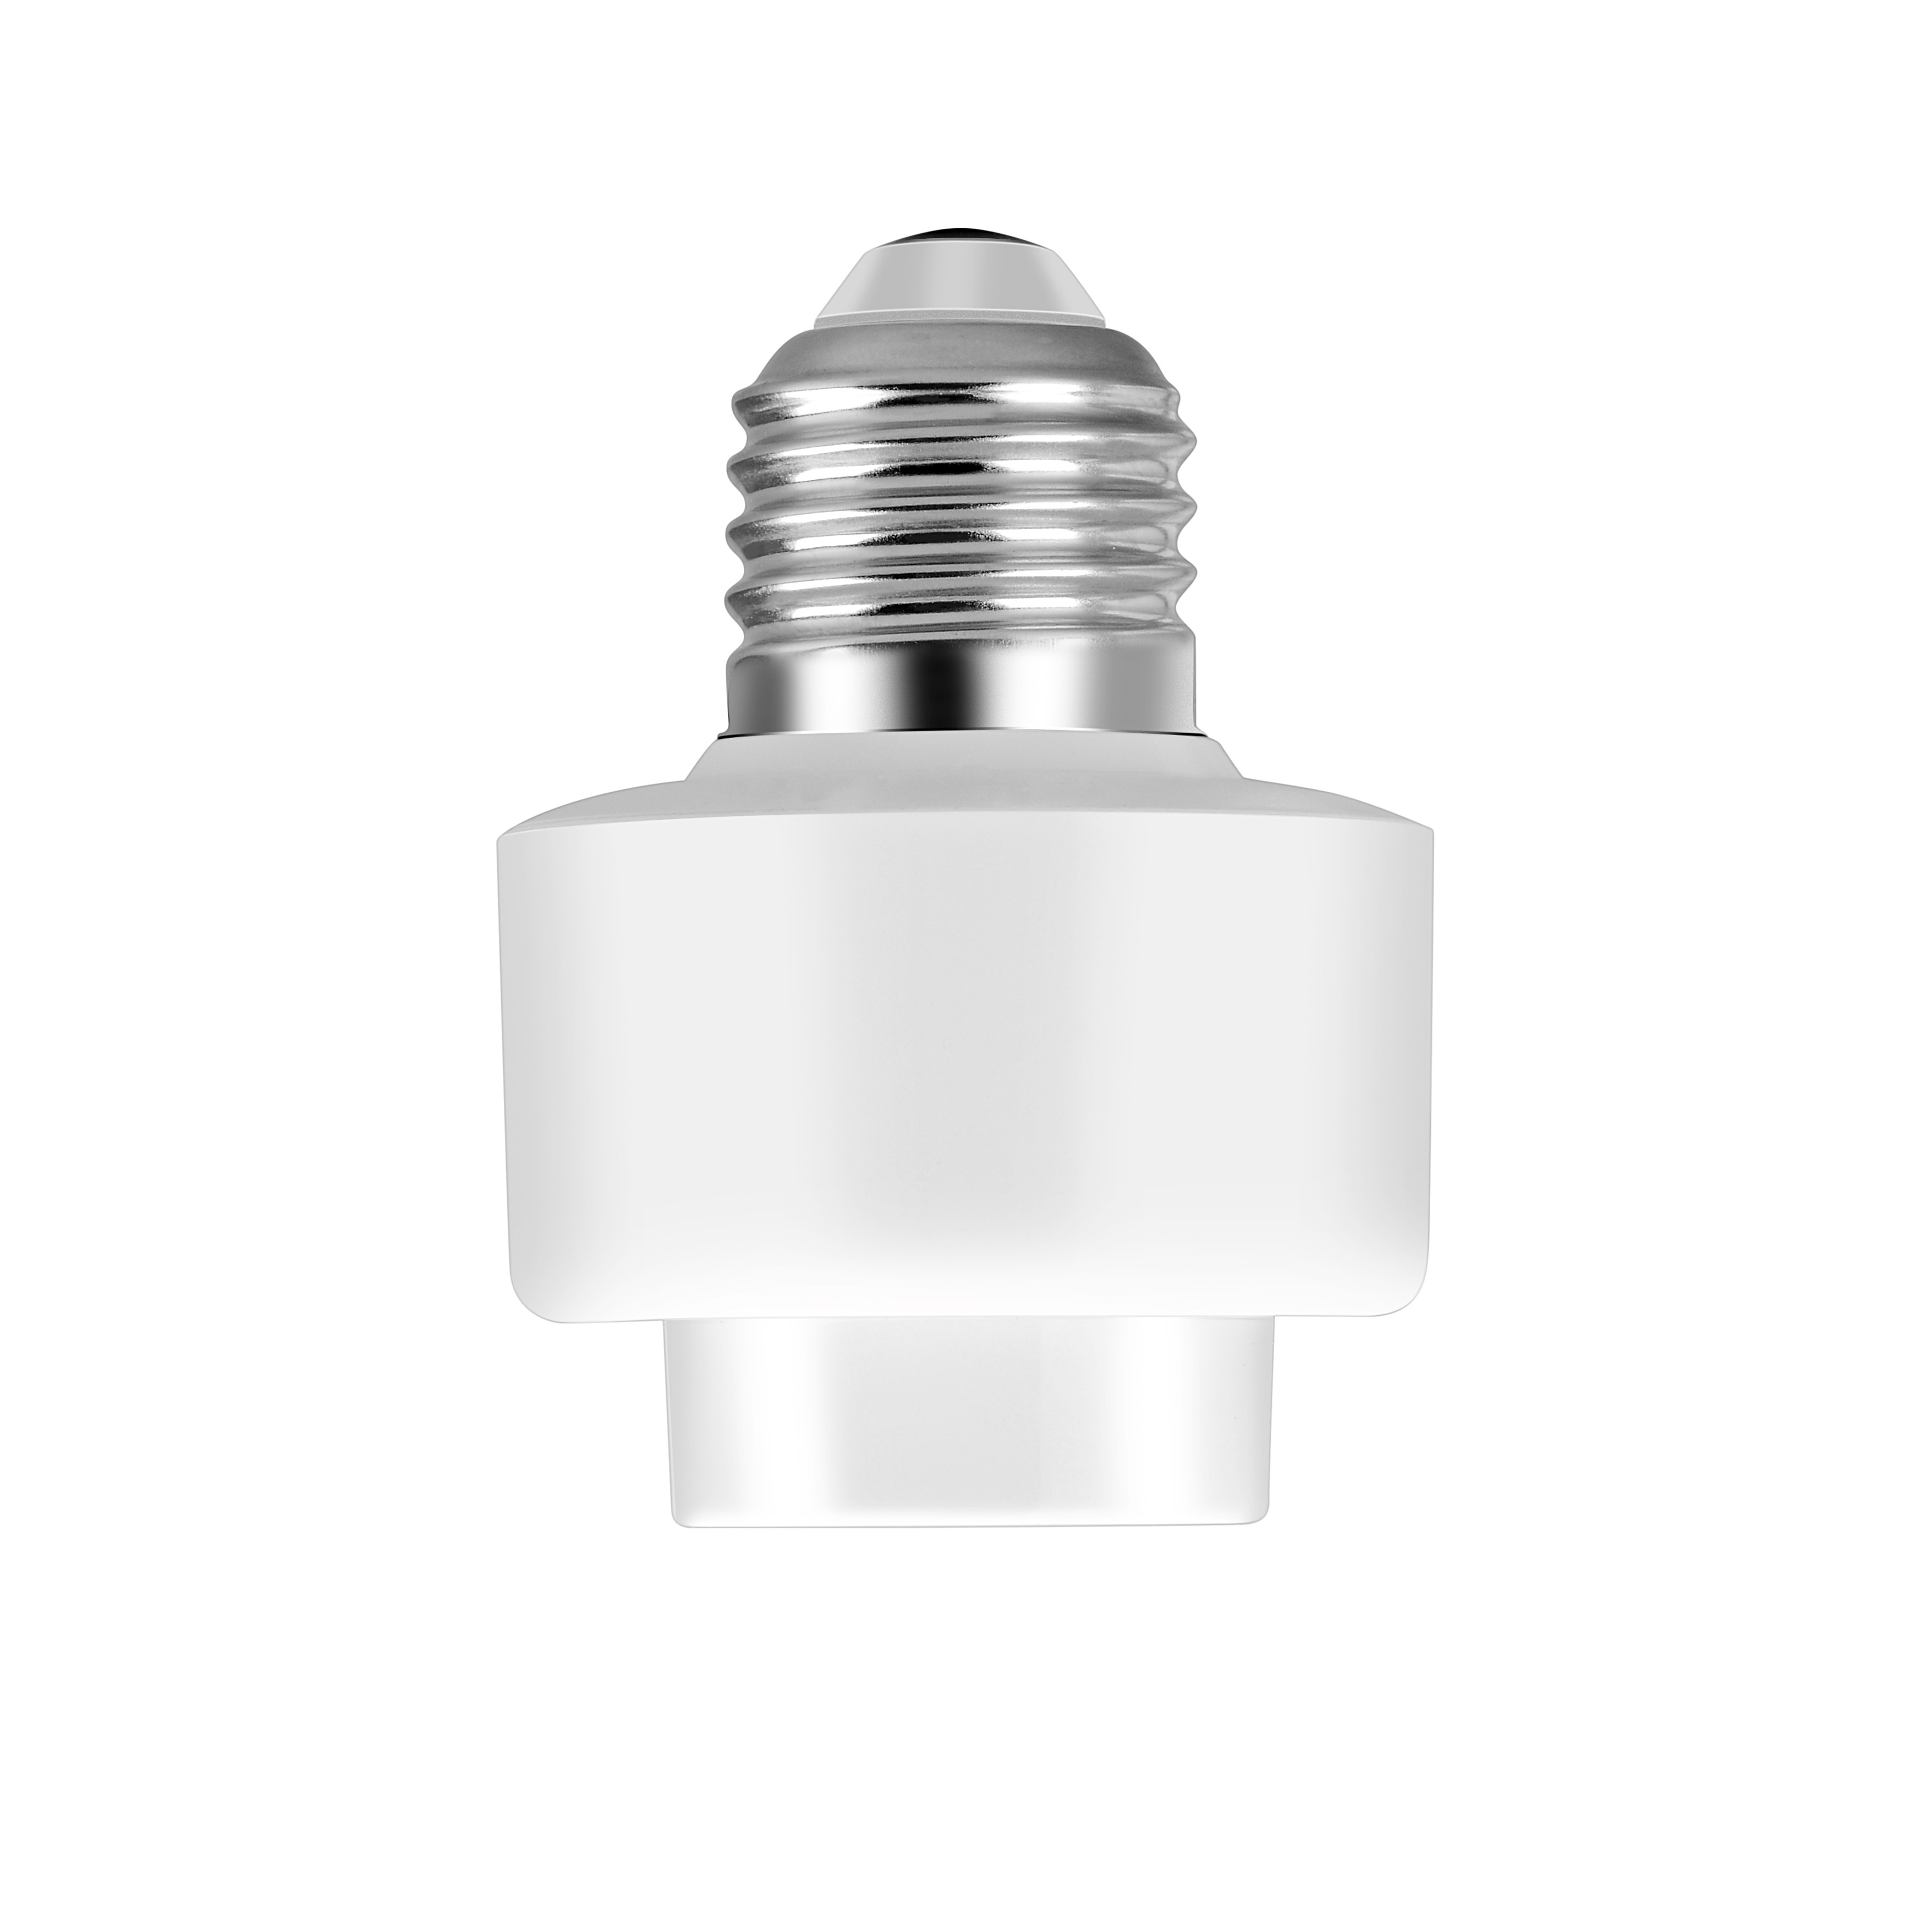 Dulie Smart Techstar® DB21, Wireless, Baza Aluminiu, Dulie E27 la E27, TuyaSmart, SmartLife imagine techstar.ro 2021